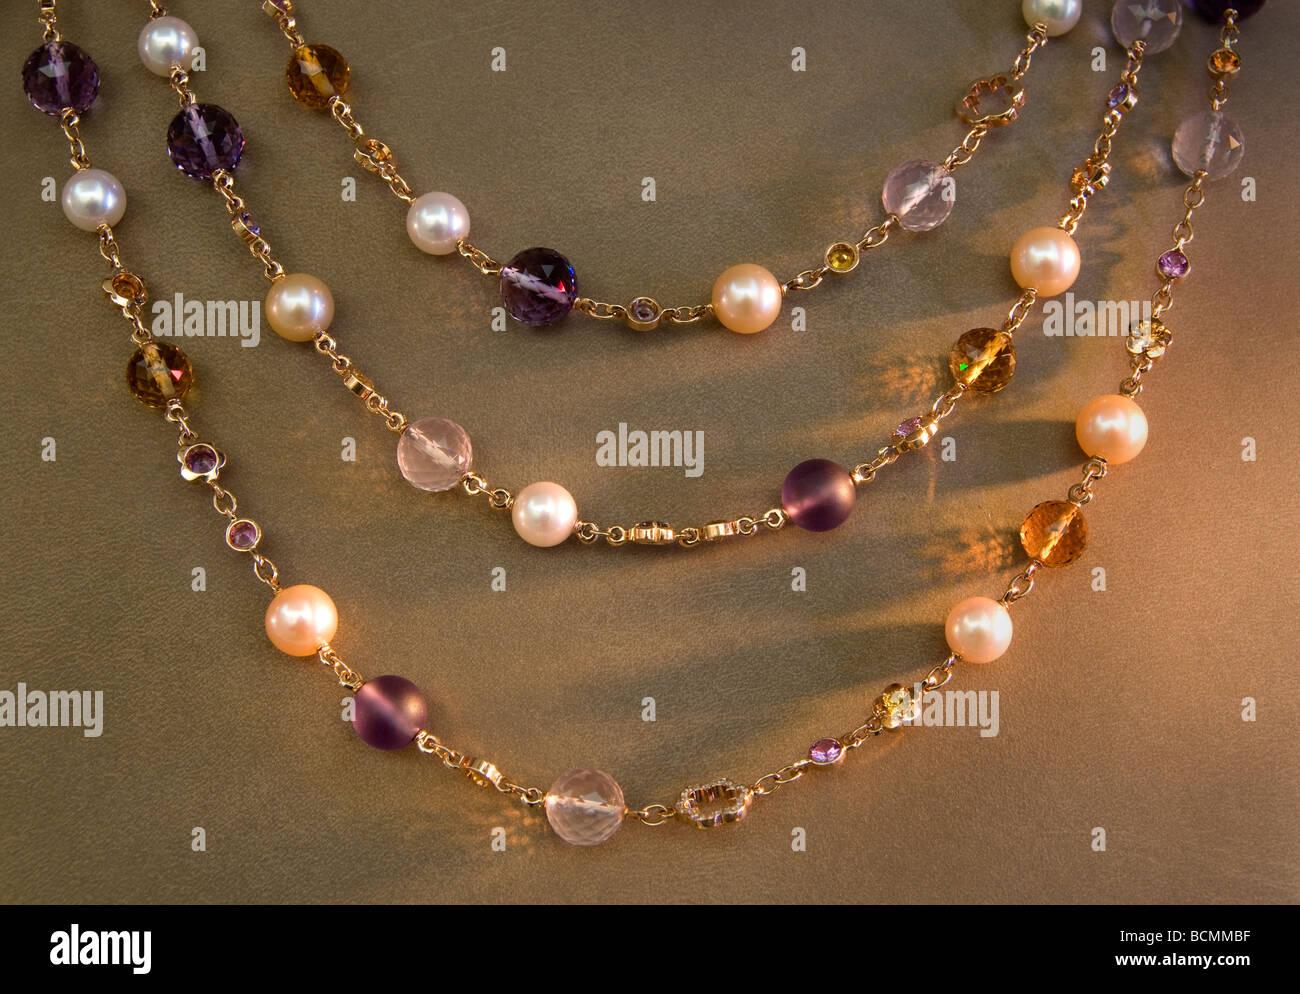 Buccellati Place Vendome Paris Juwel Juweler chain - Stock Image